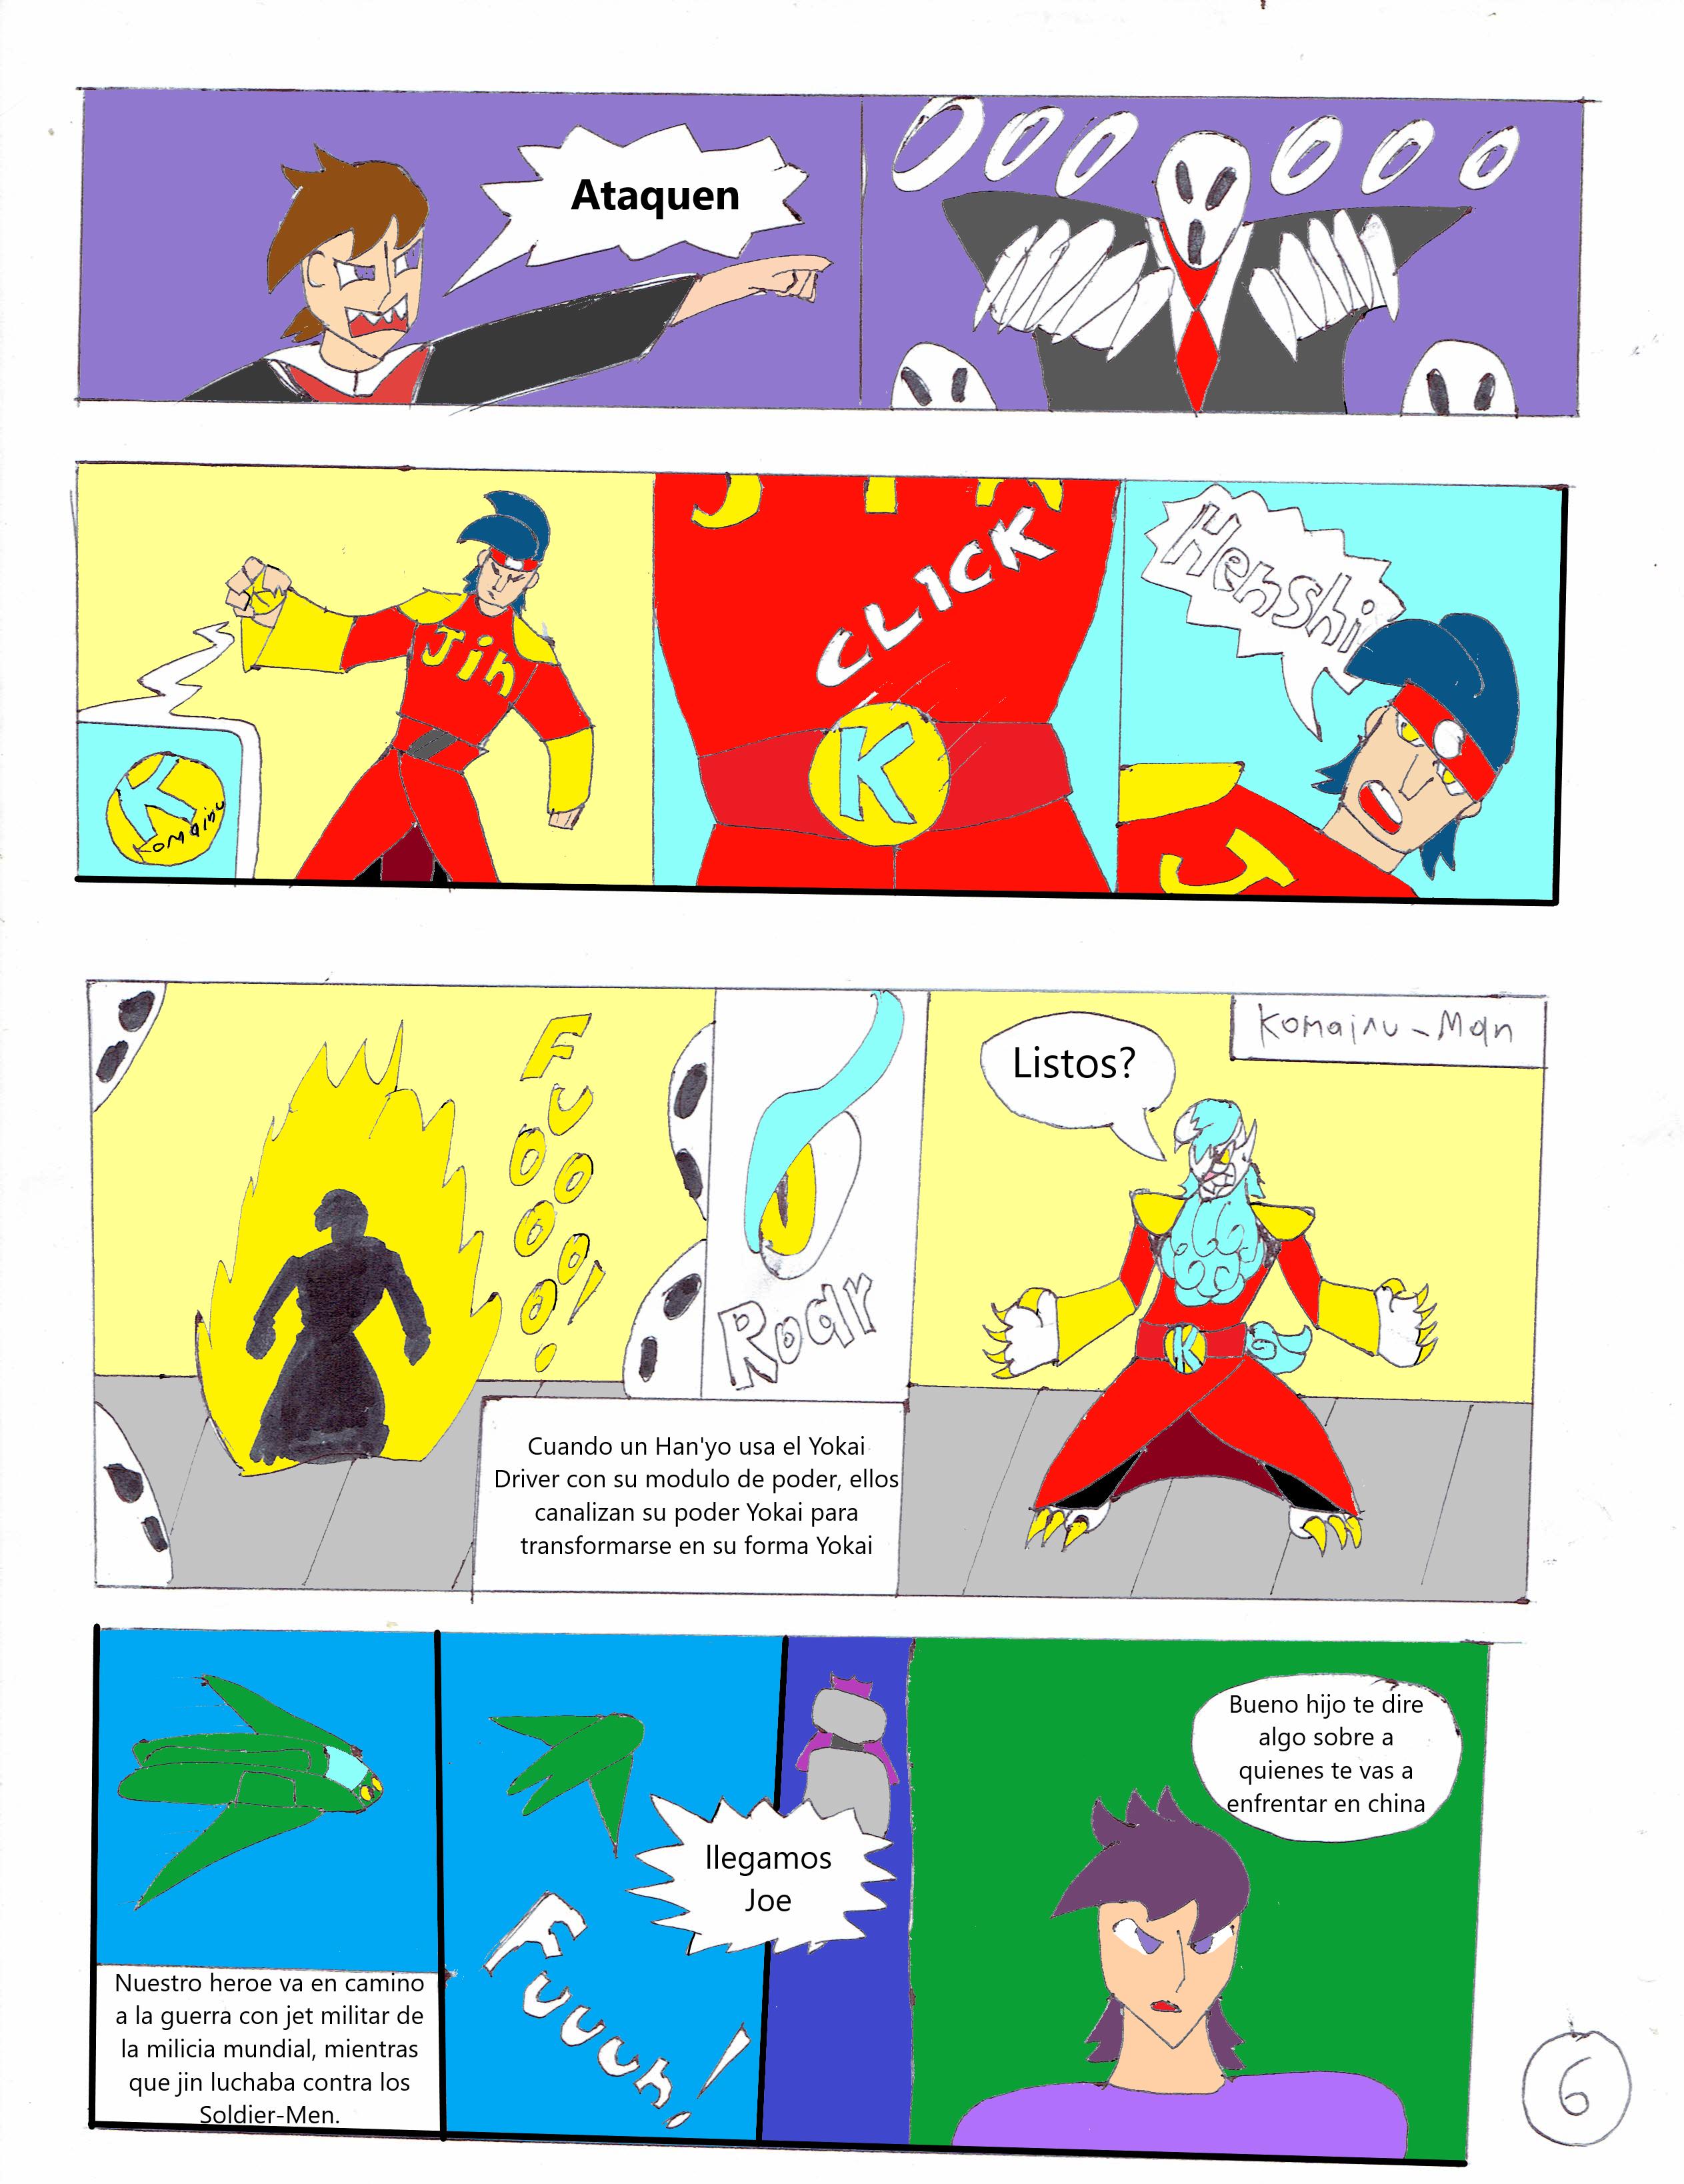 KyubiMan Capitulo 1 Parte 2